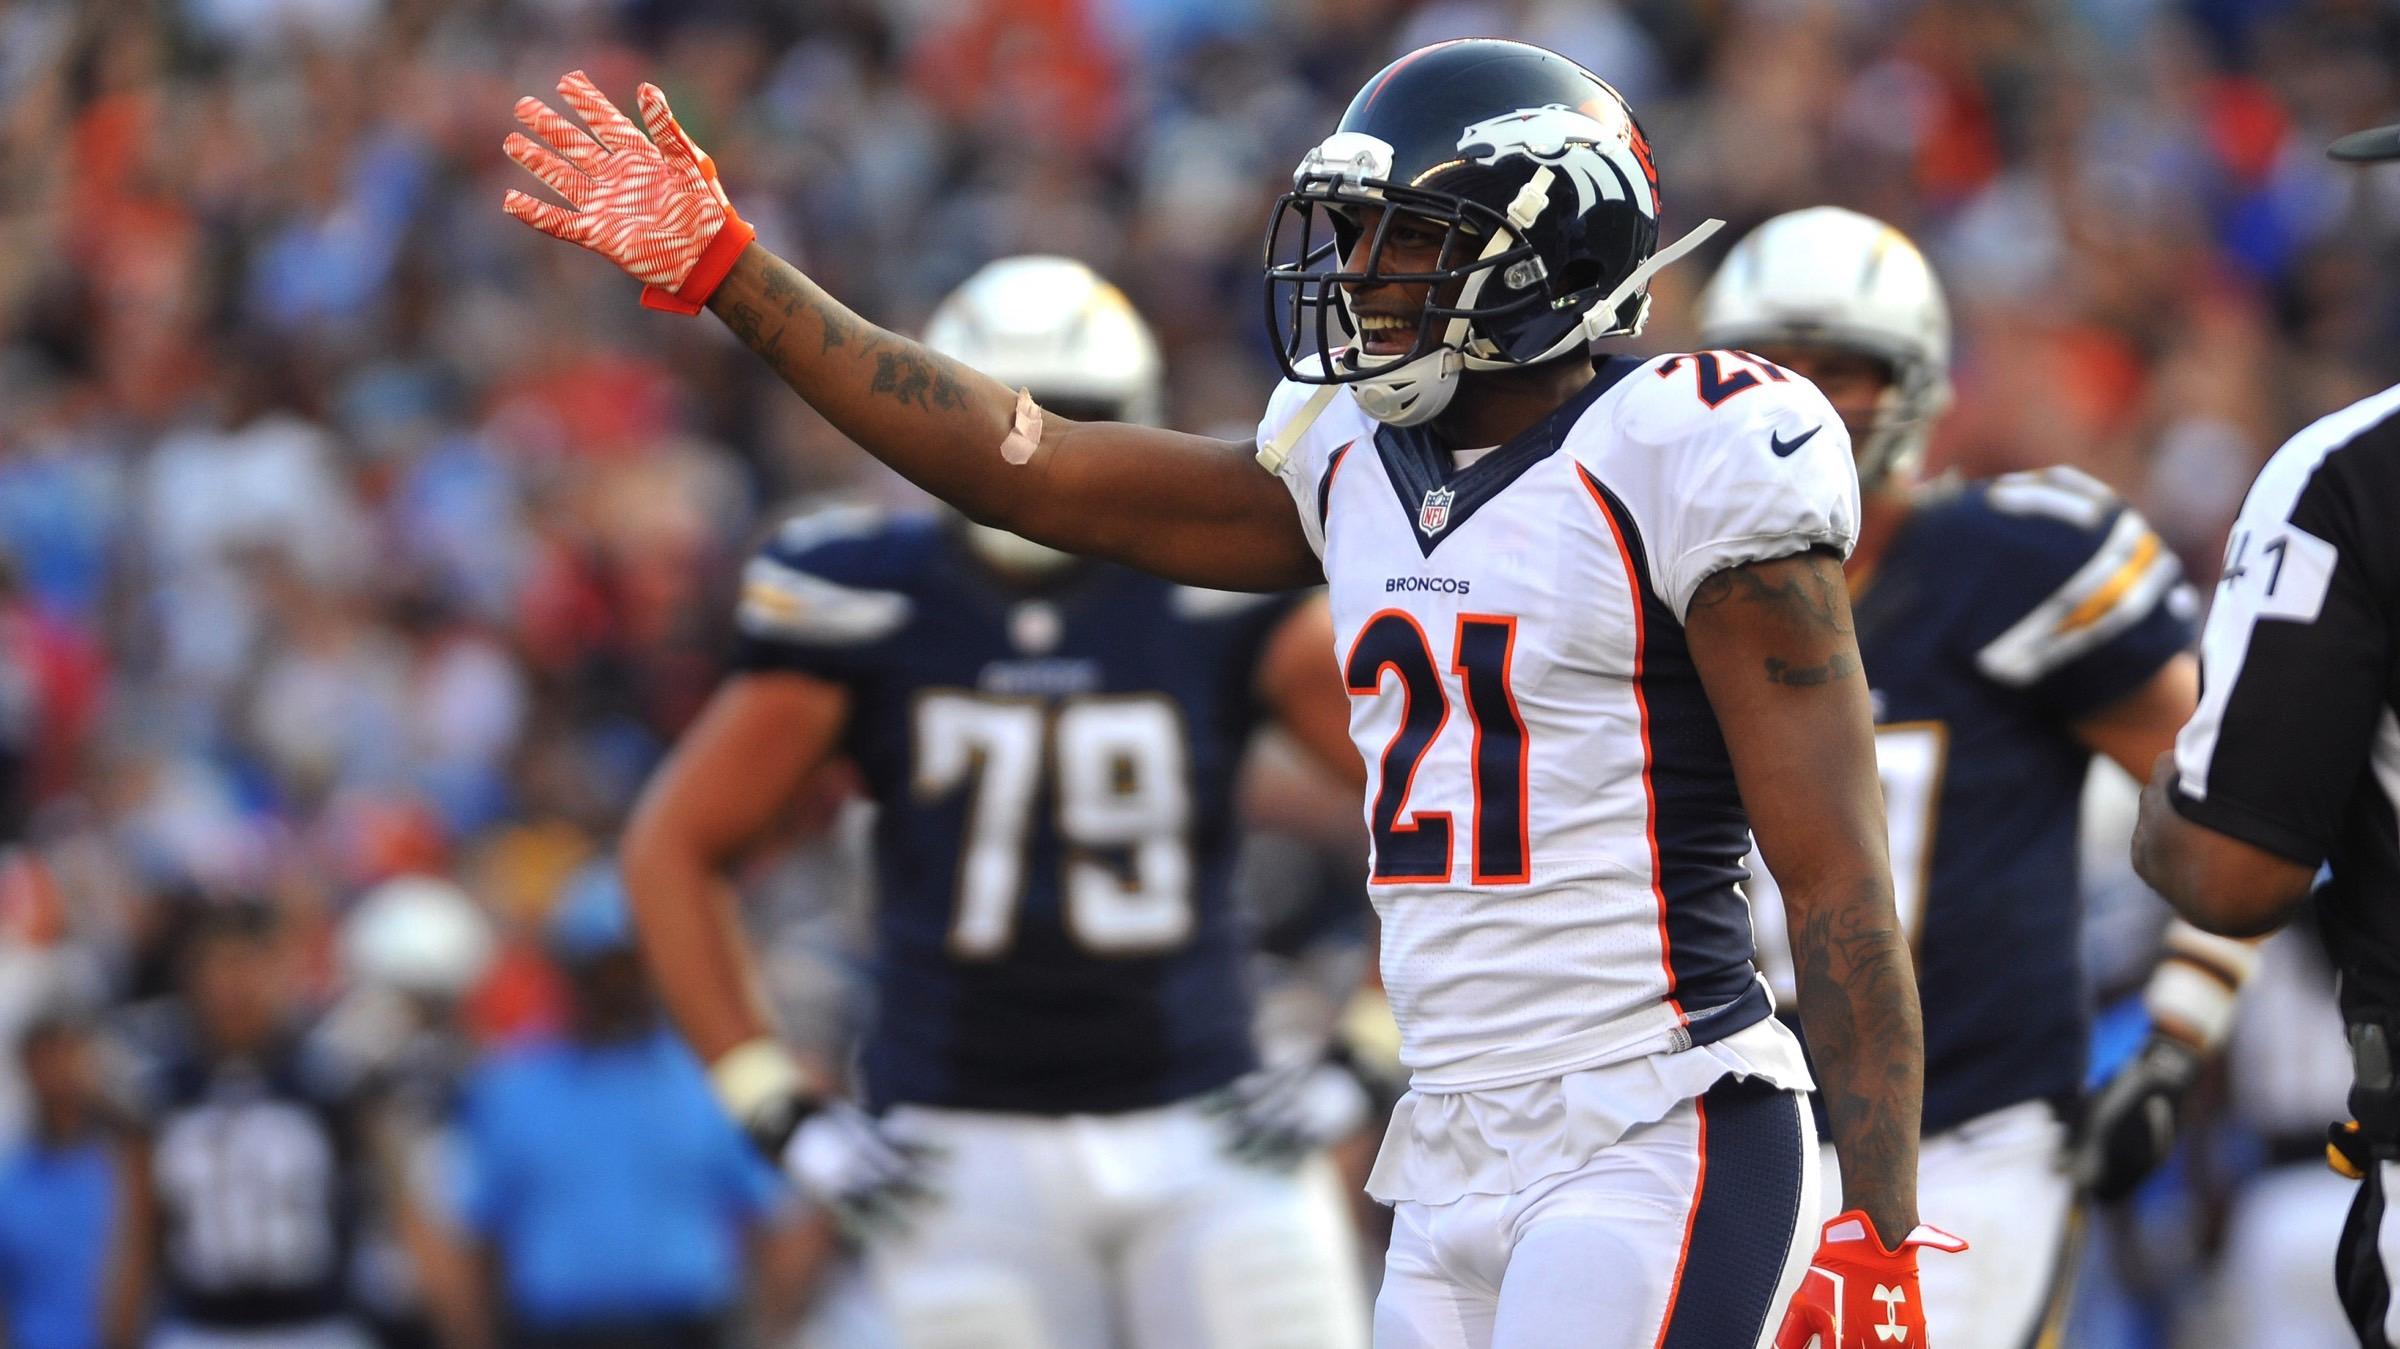 NFL: Denver Broncos at San Diego Chargers